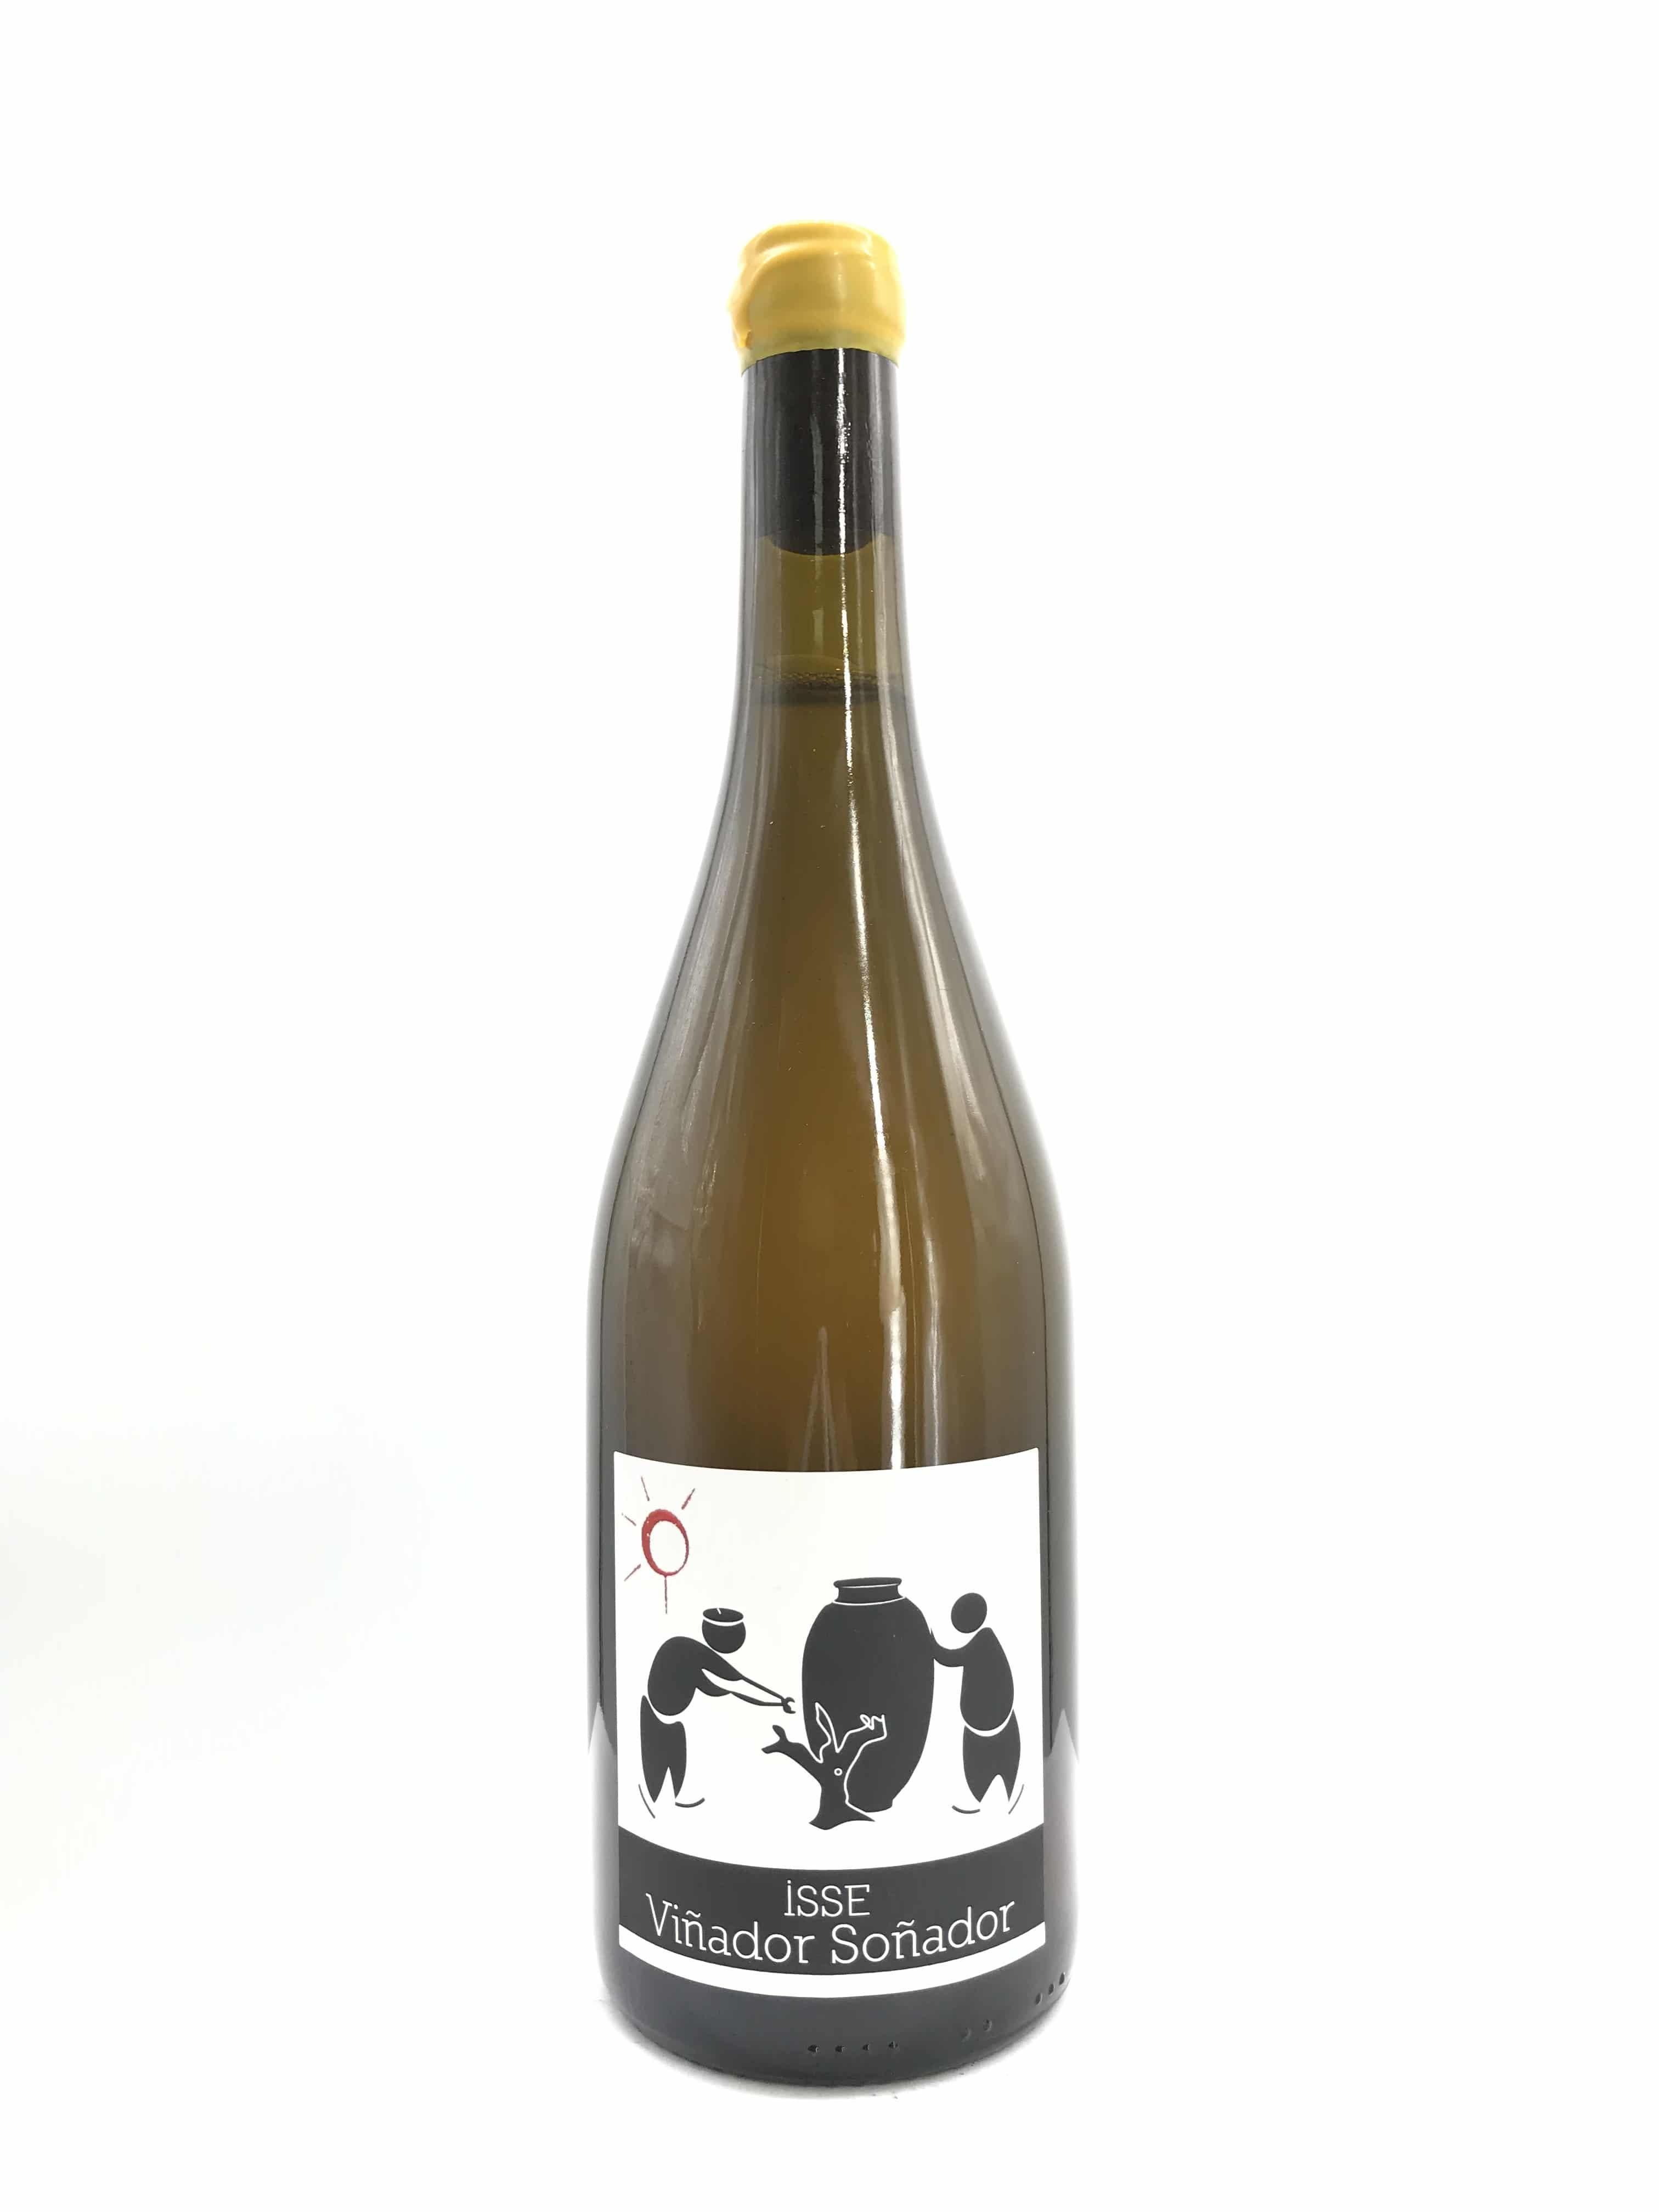 Microbio Wines Isse